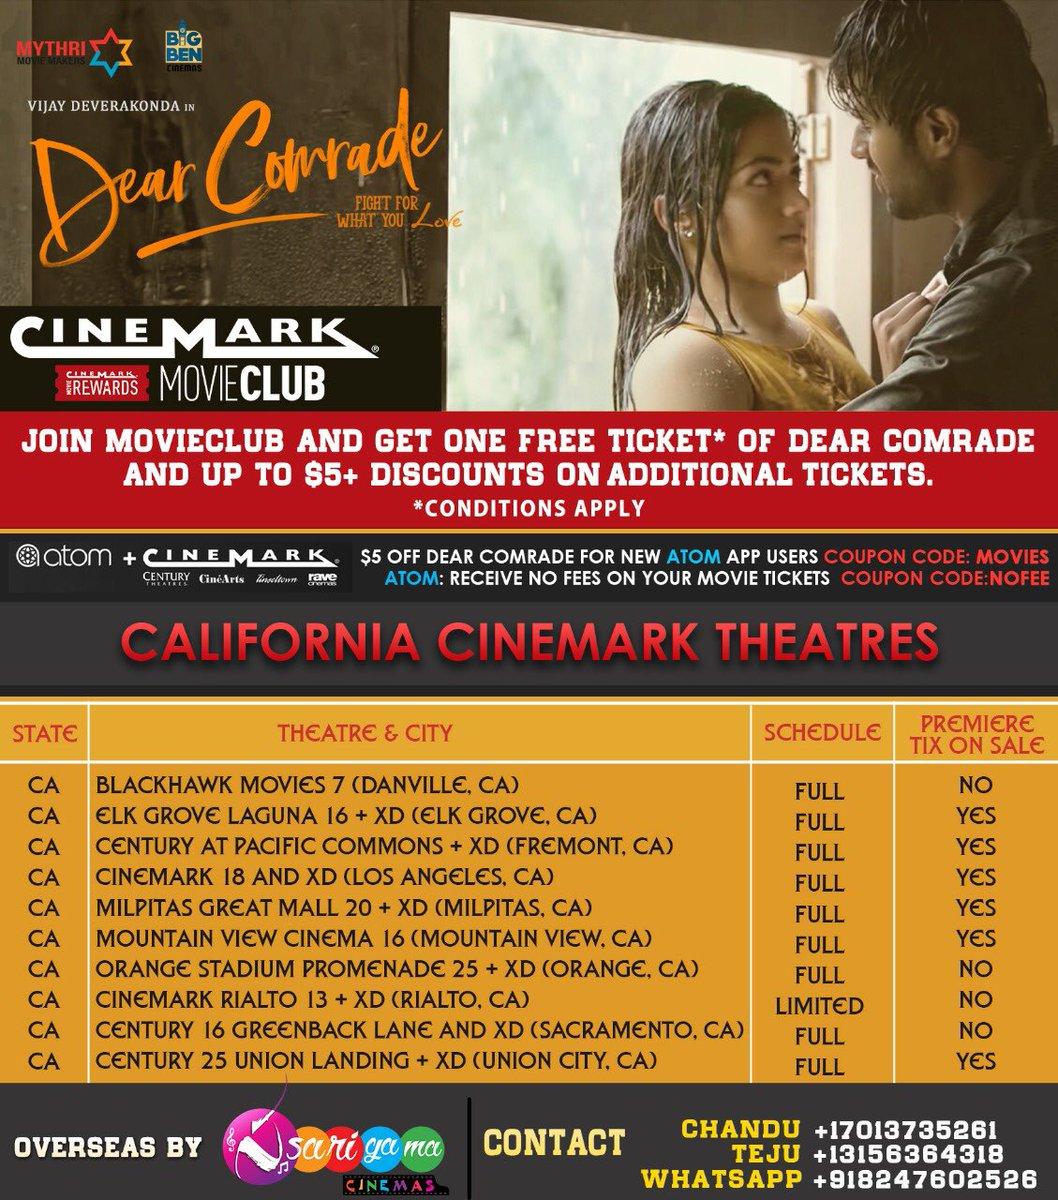 Sarigama Cinemas on Twitter: